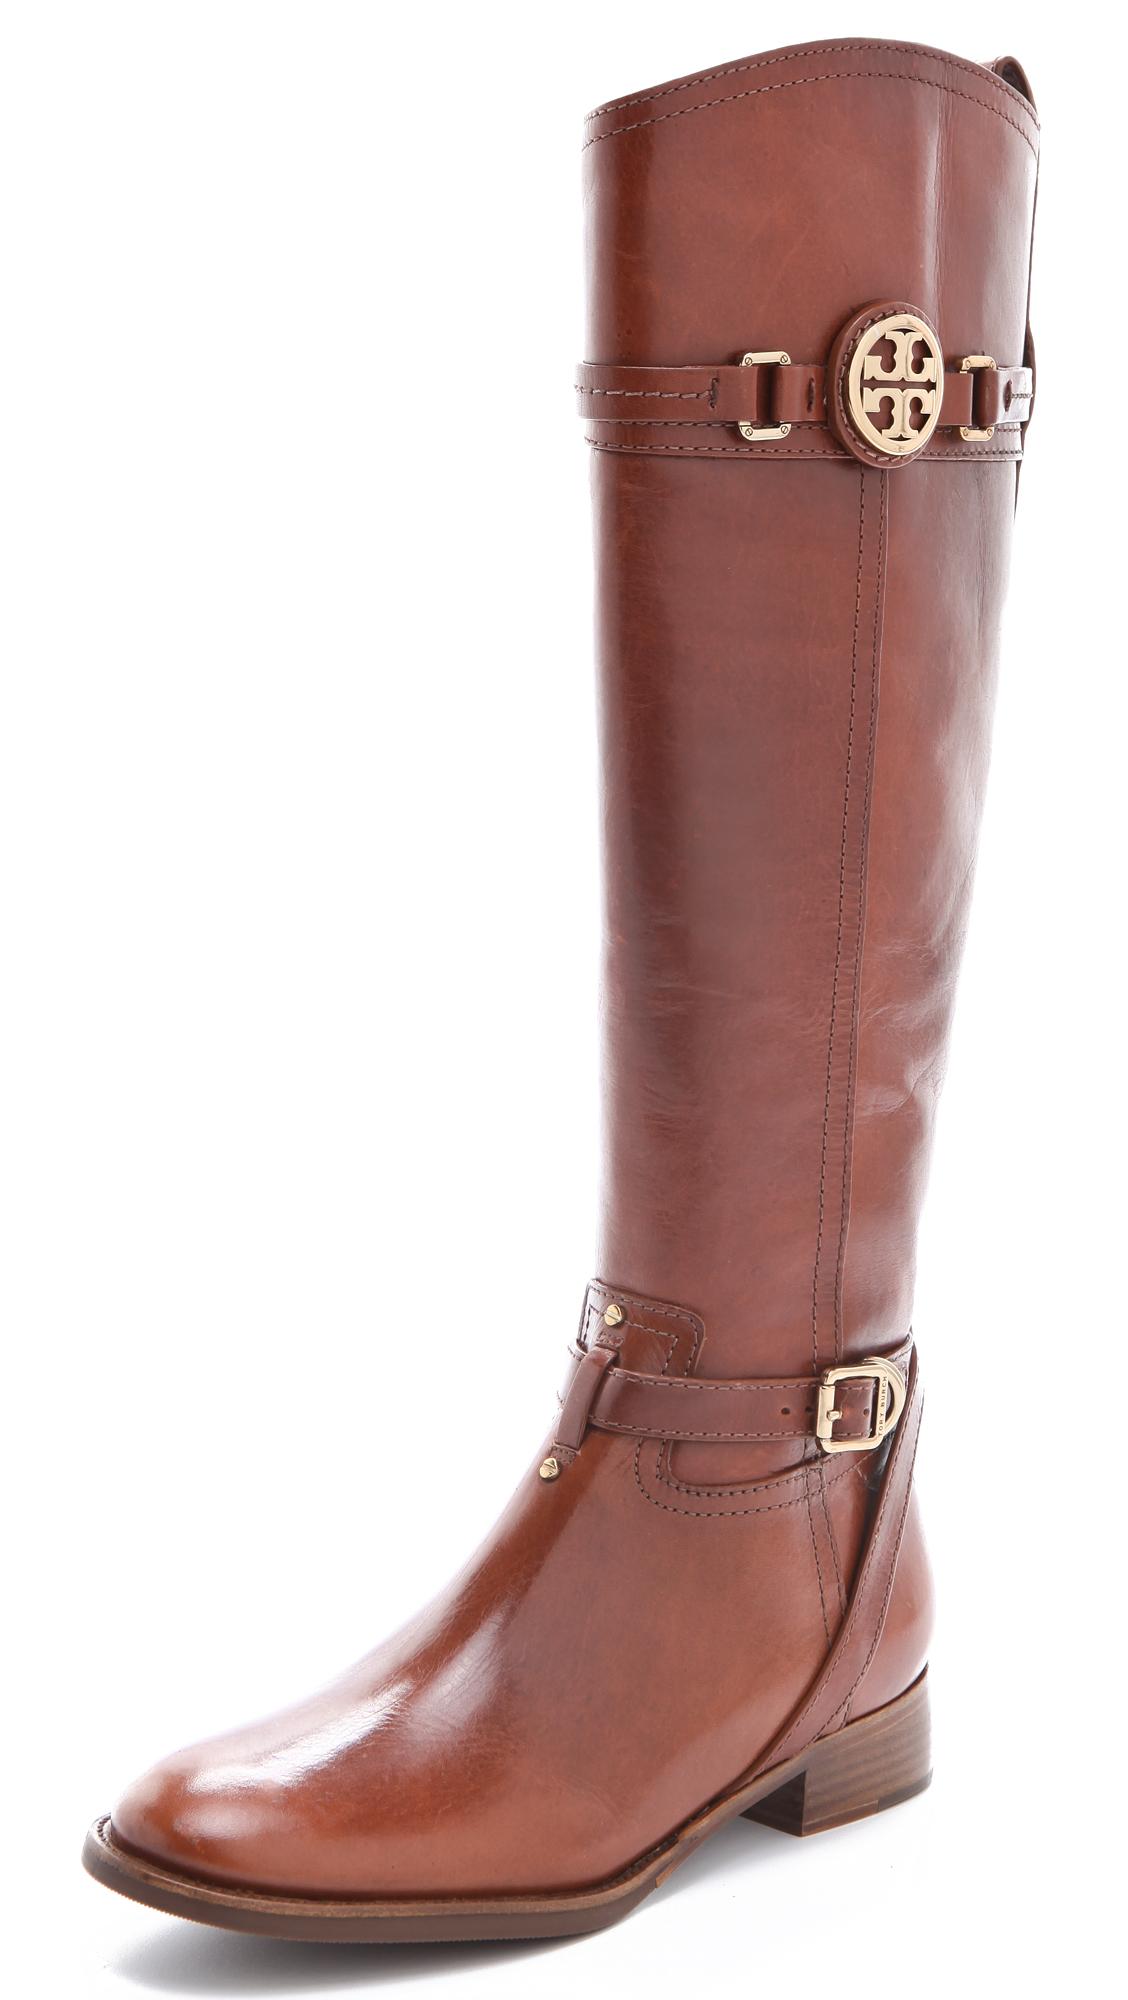 8e906495e1ce Tory Burch Calista Riding Boots